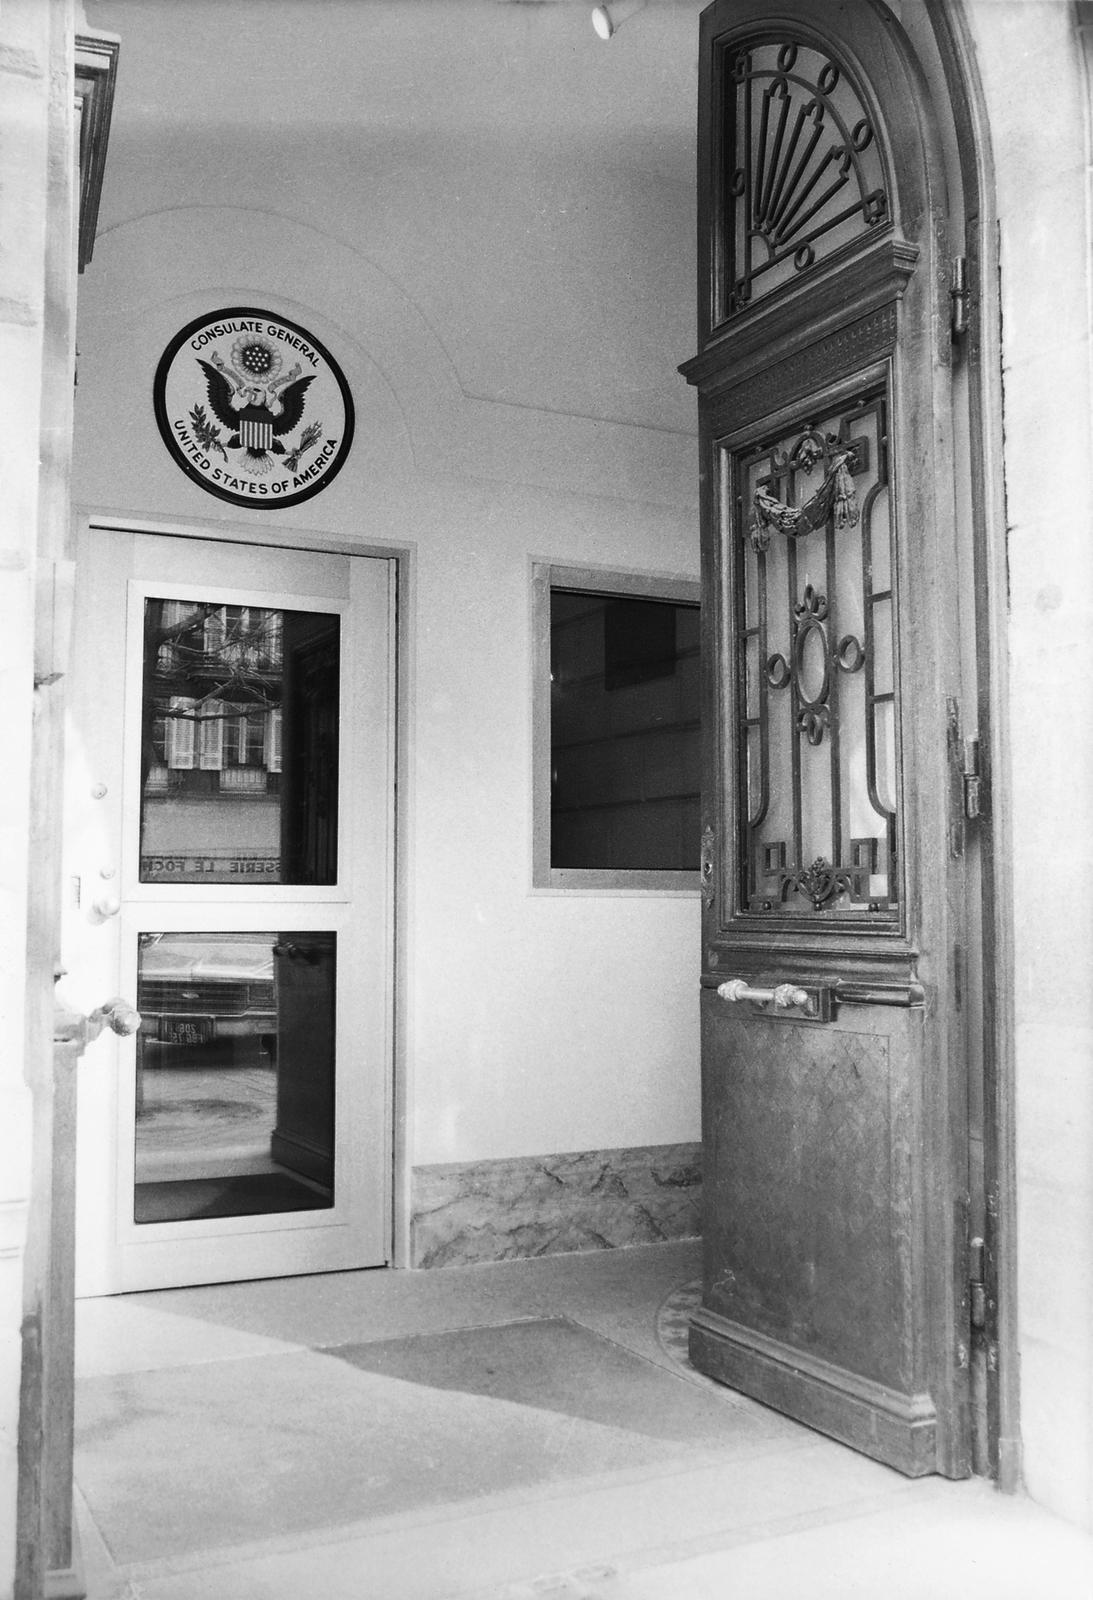 Bordeaux - Consulate Office Building - 1985